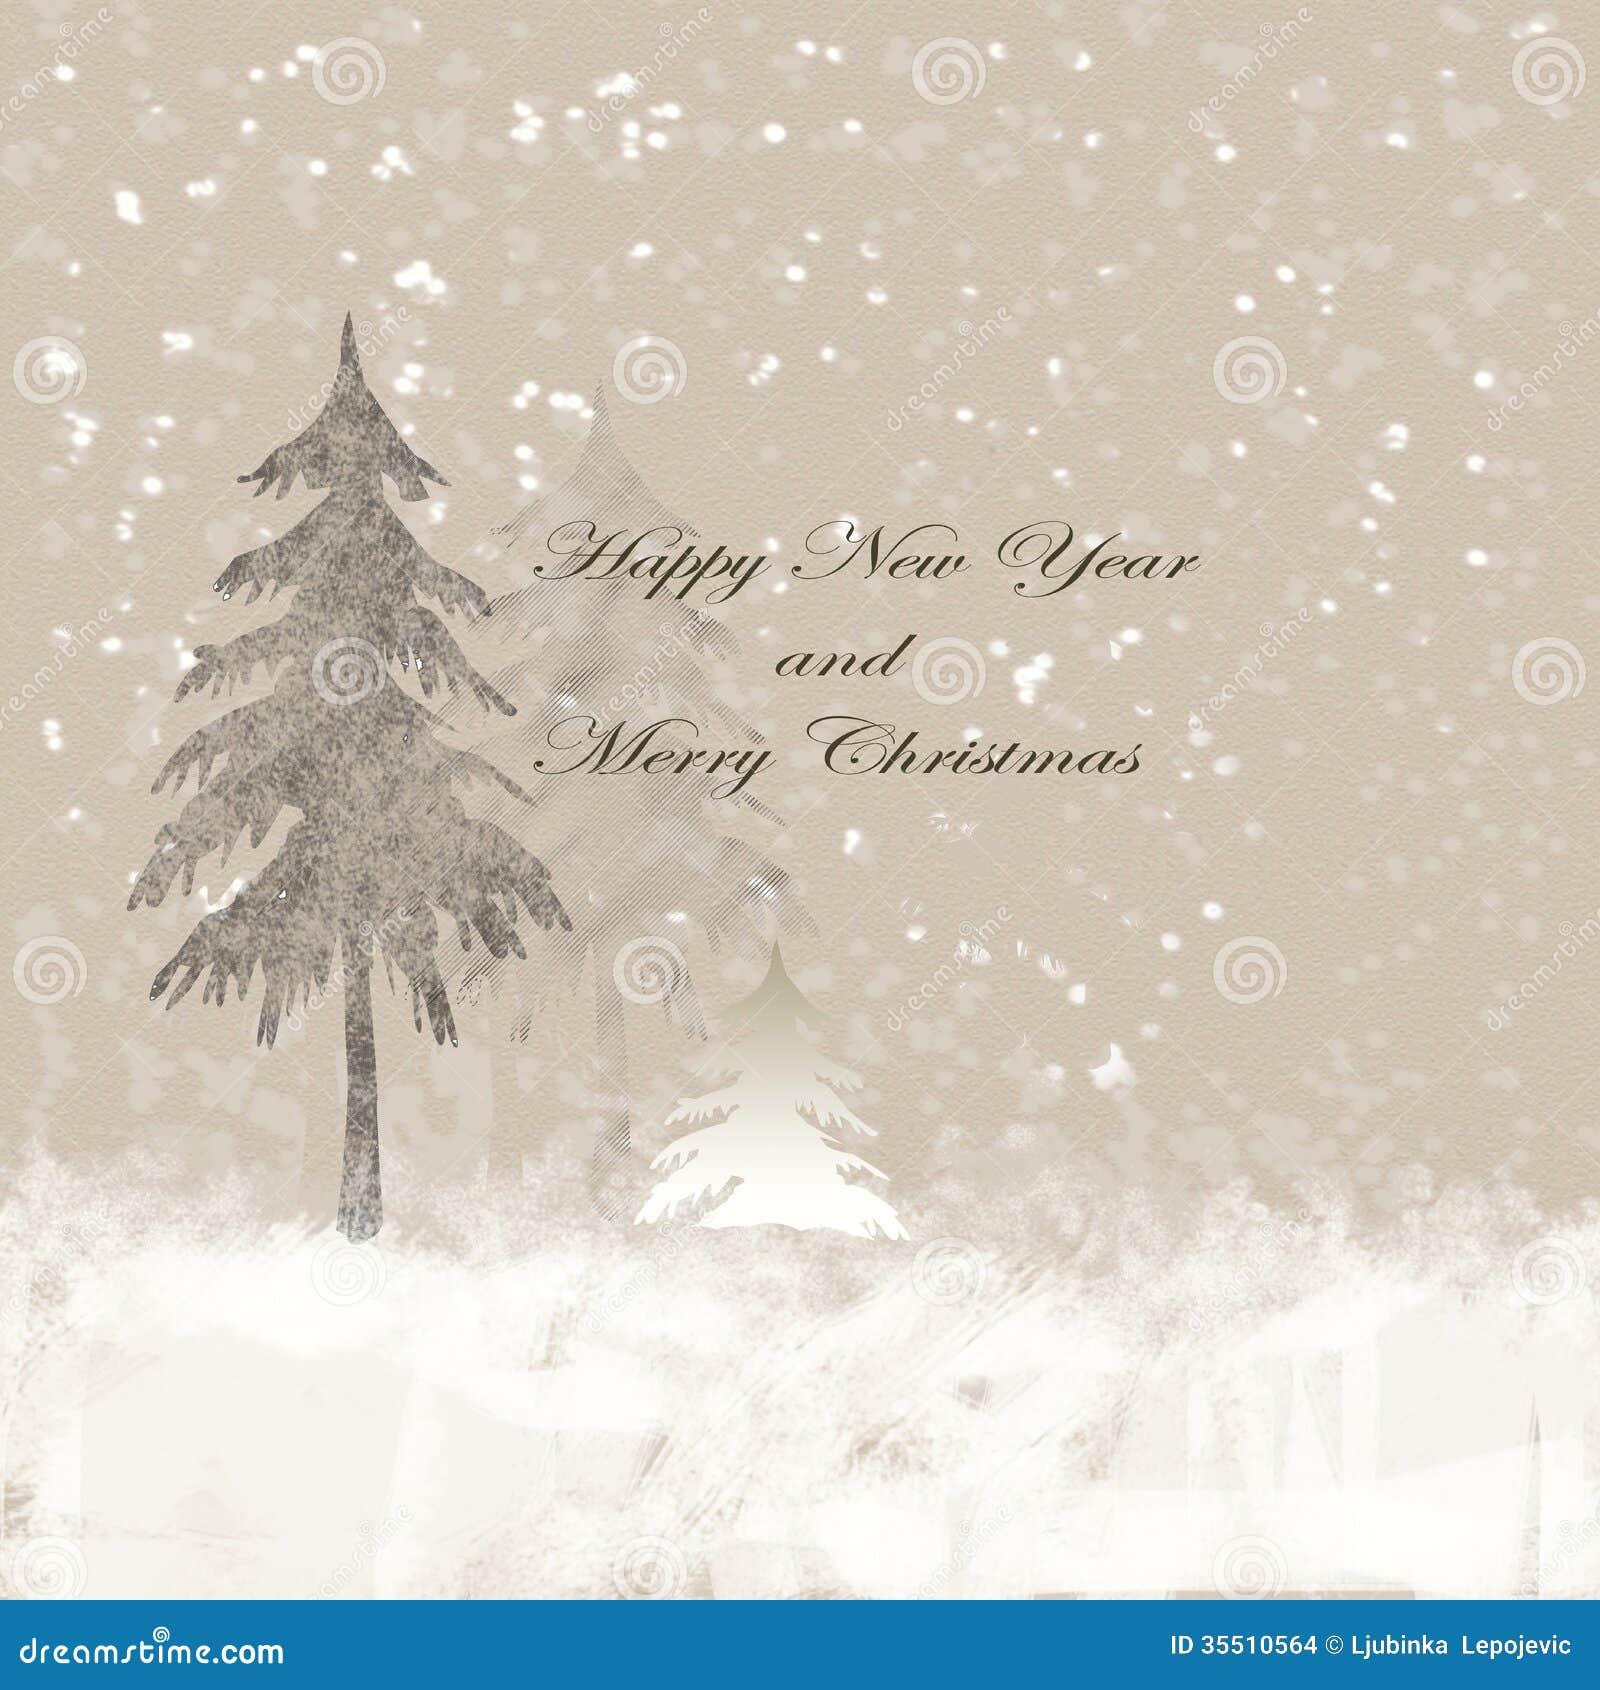 Happy New Year Elegant Images 15